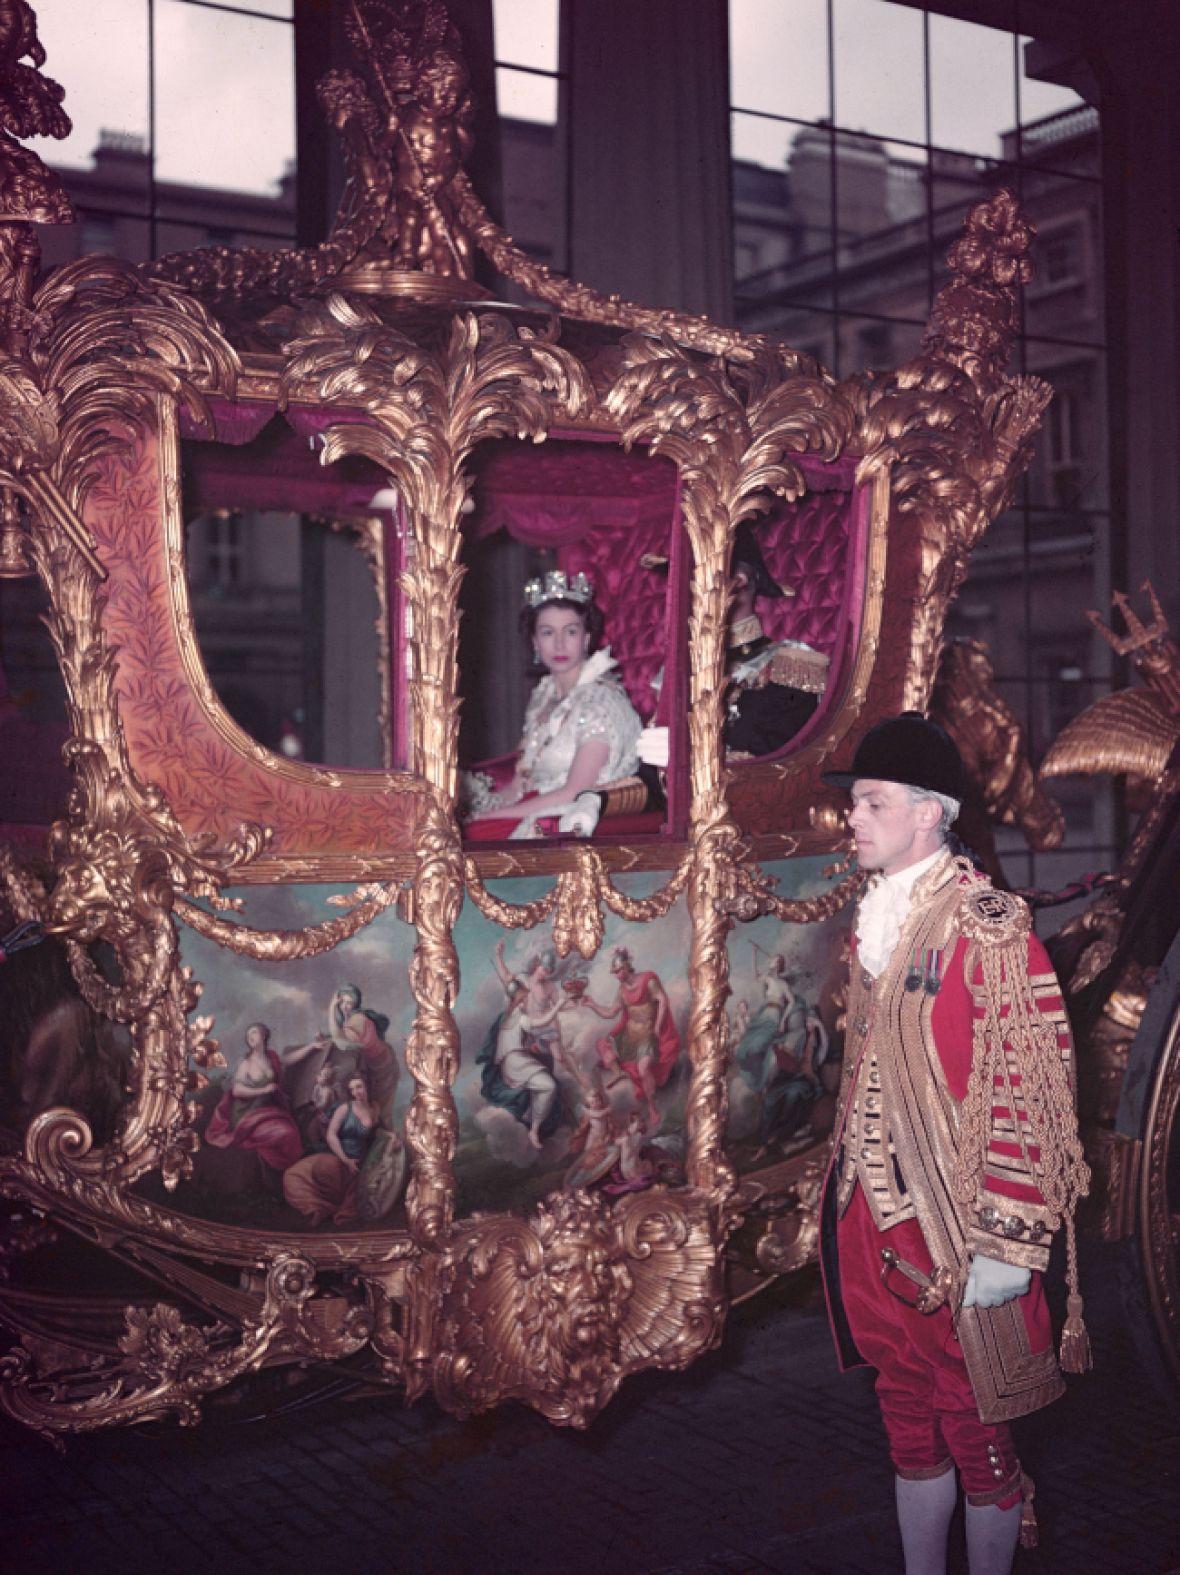 queen elizabeth coronation coach getty images